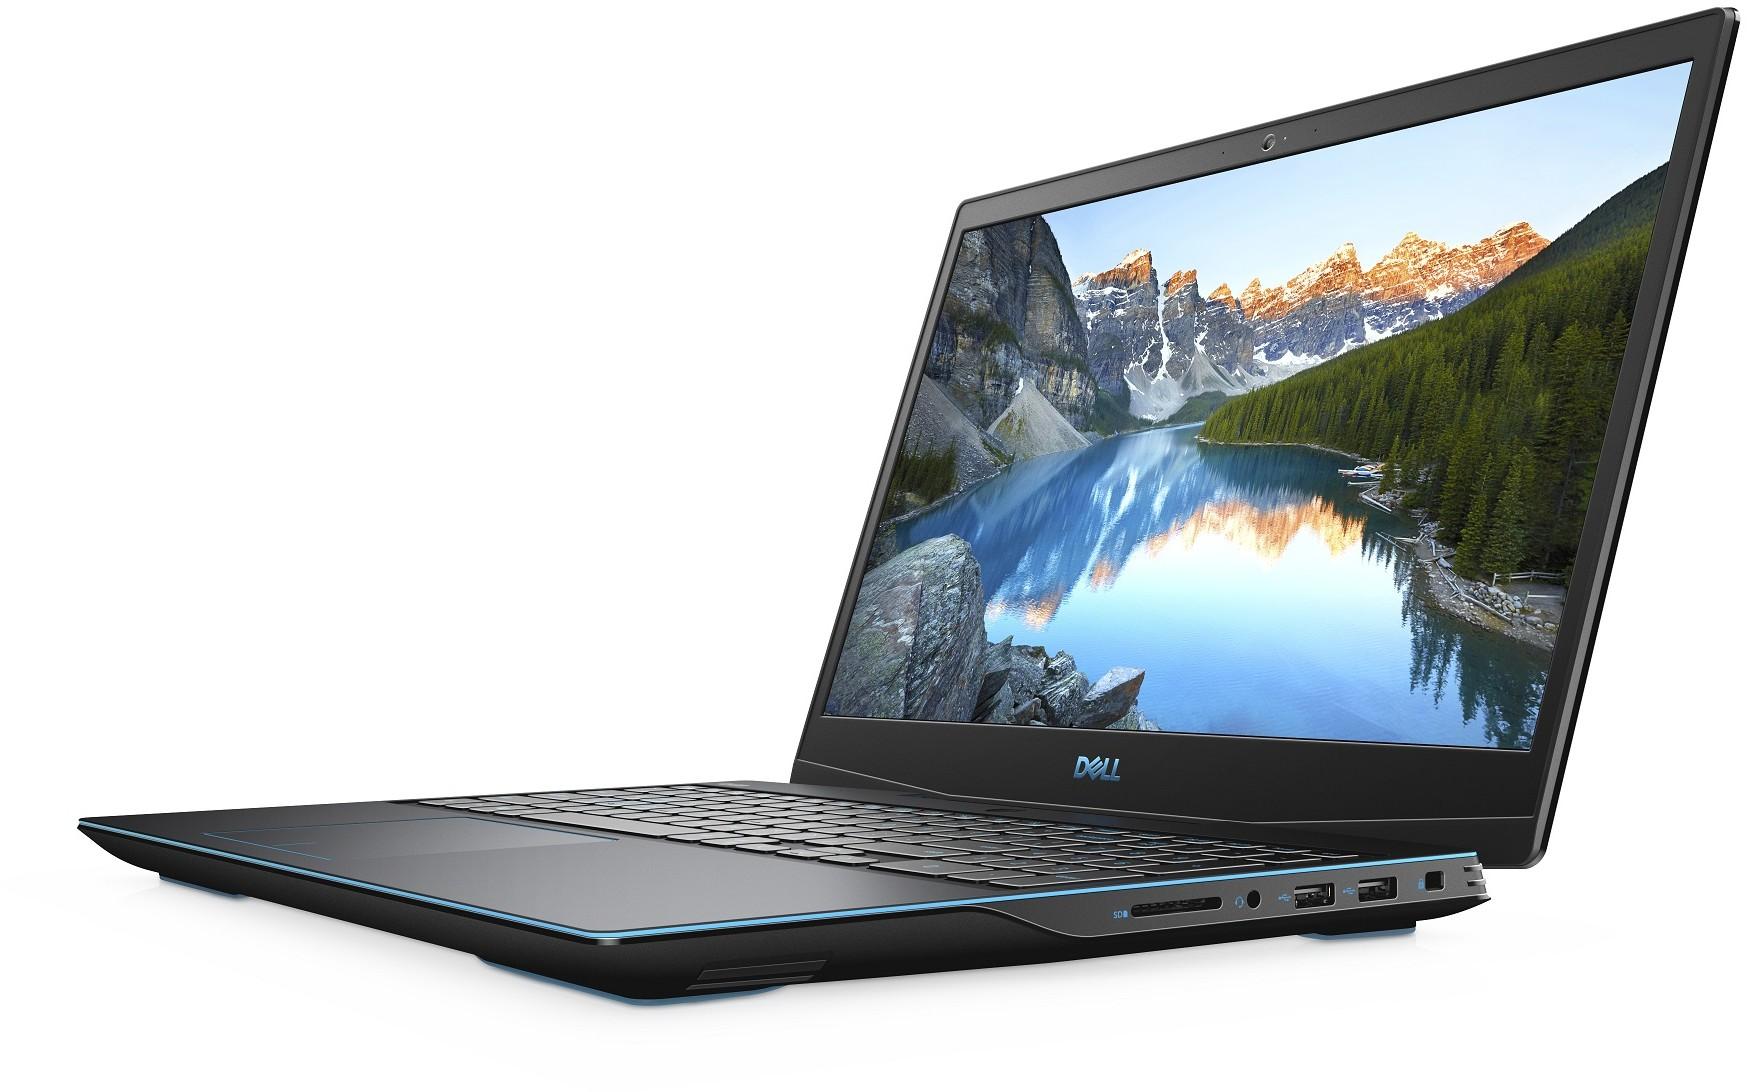 Dell Inspiron G3 3500 (3500-4397)